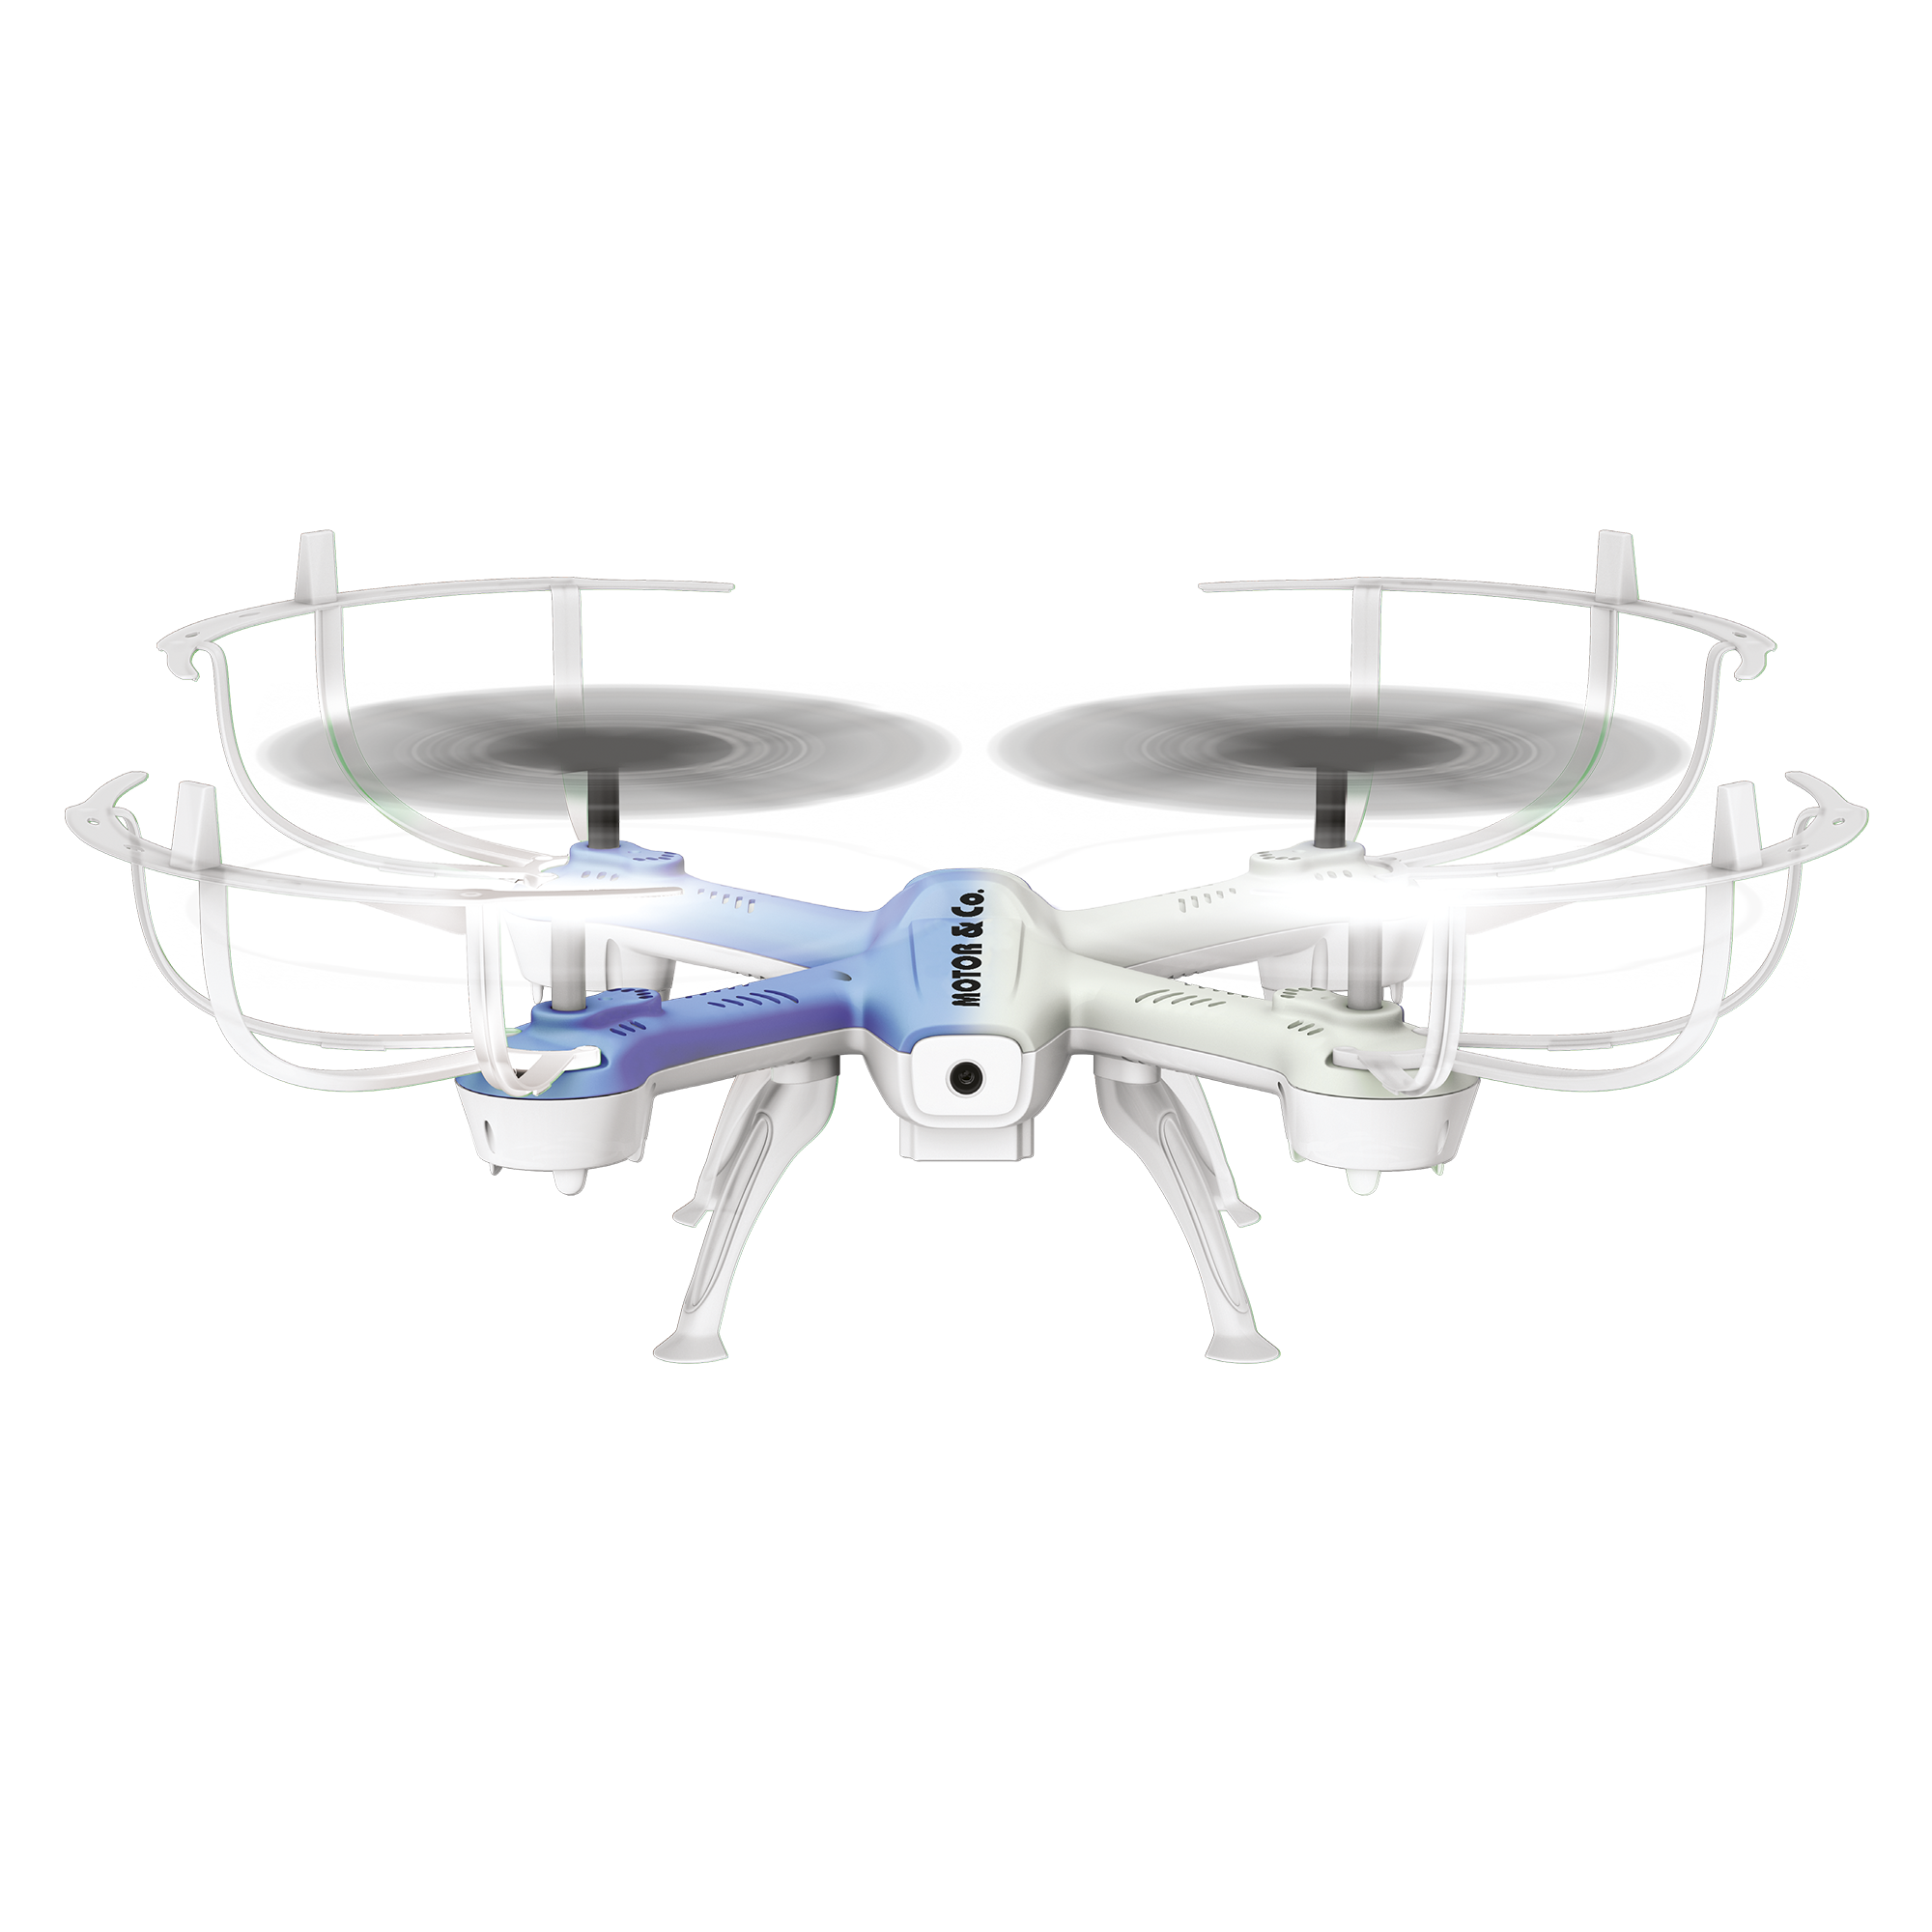 Powerful drone - MOTOR&CO R/C